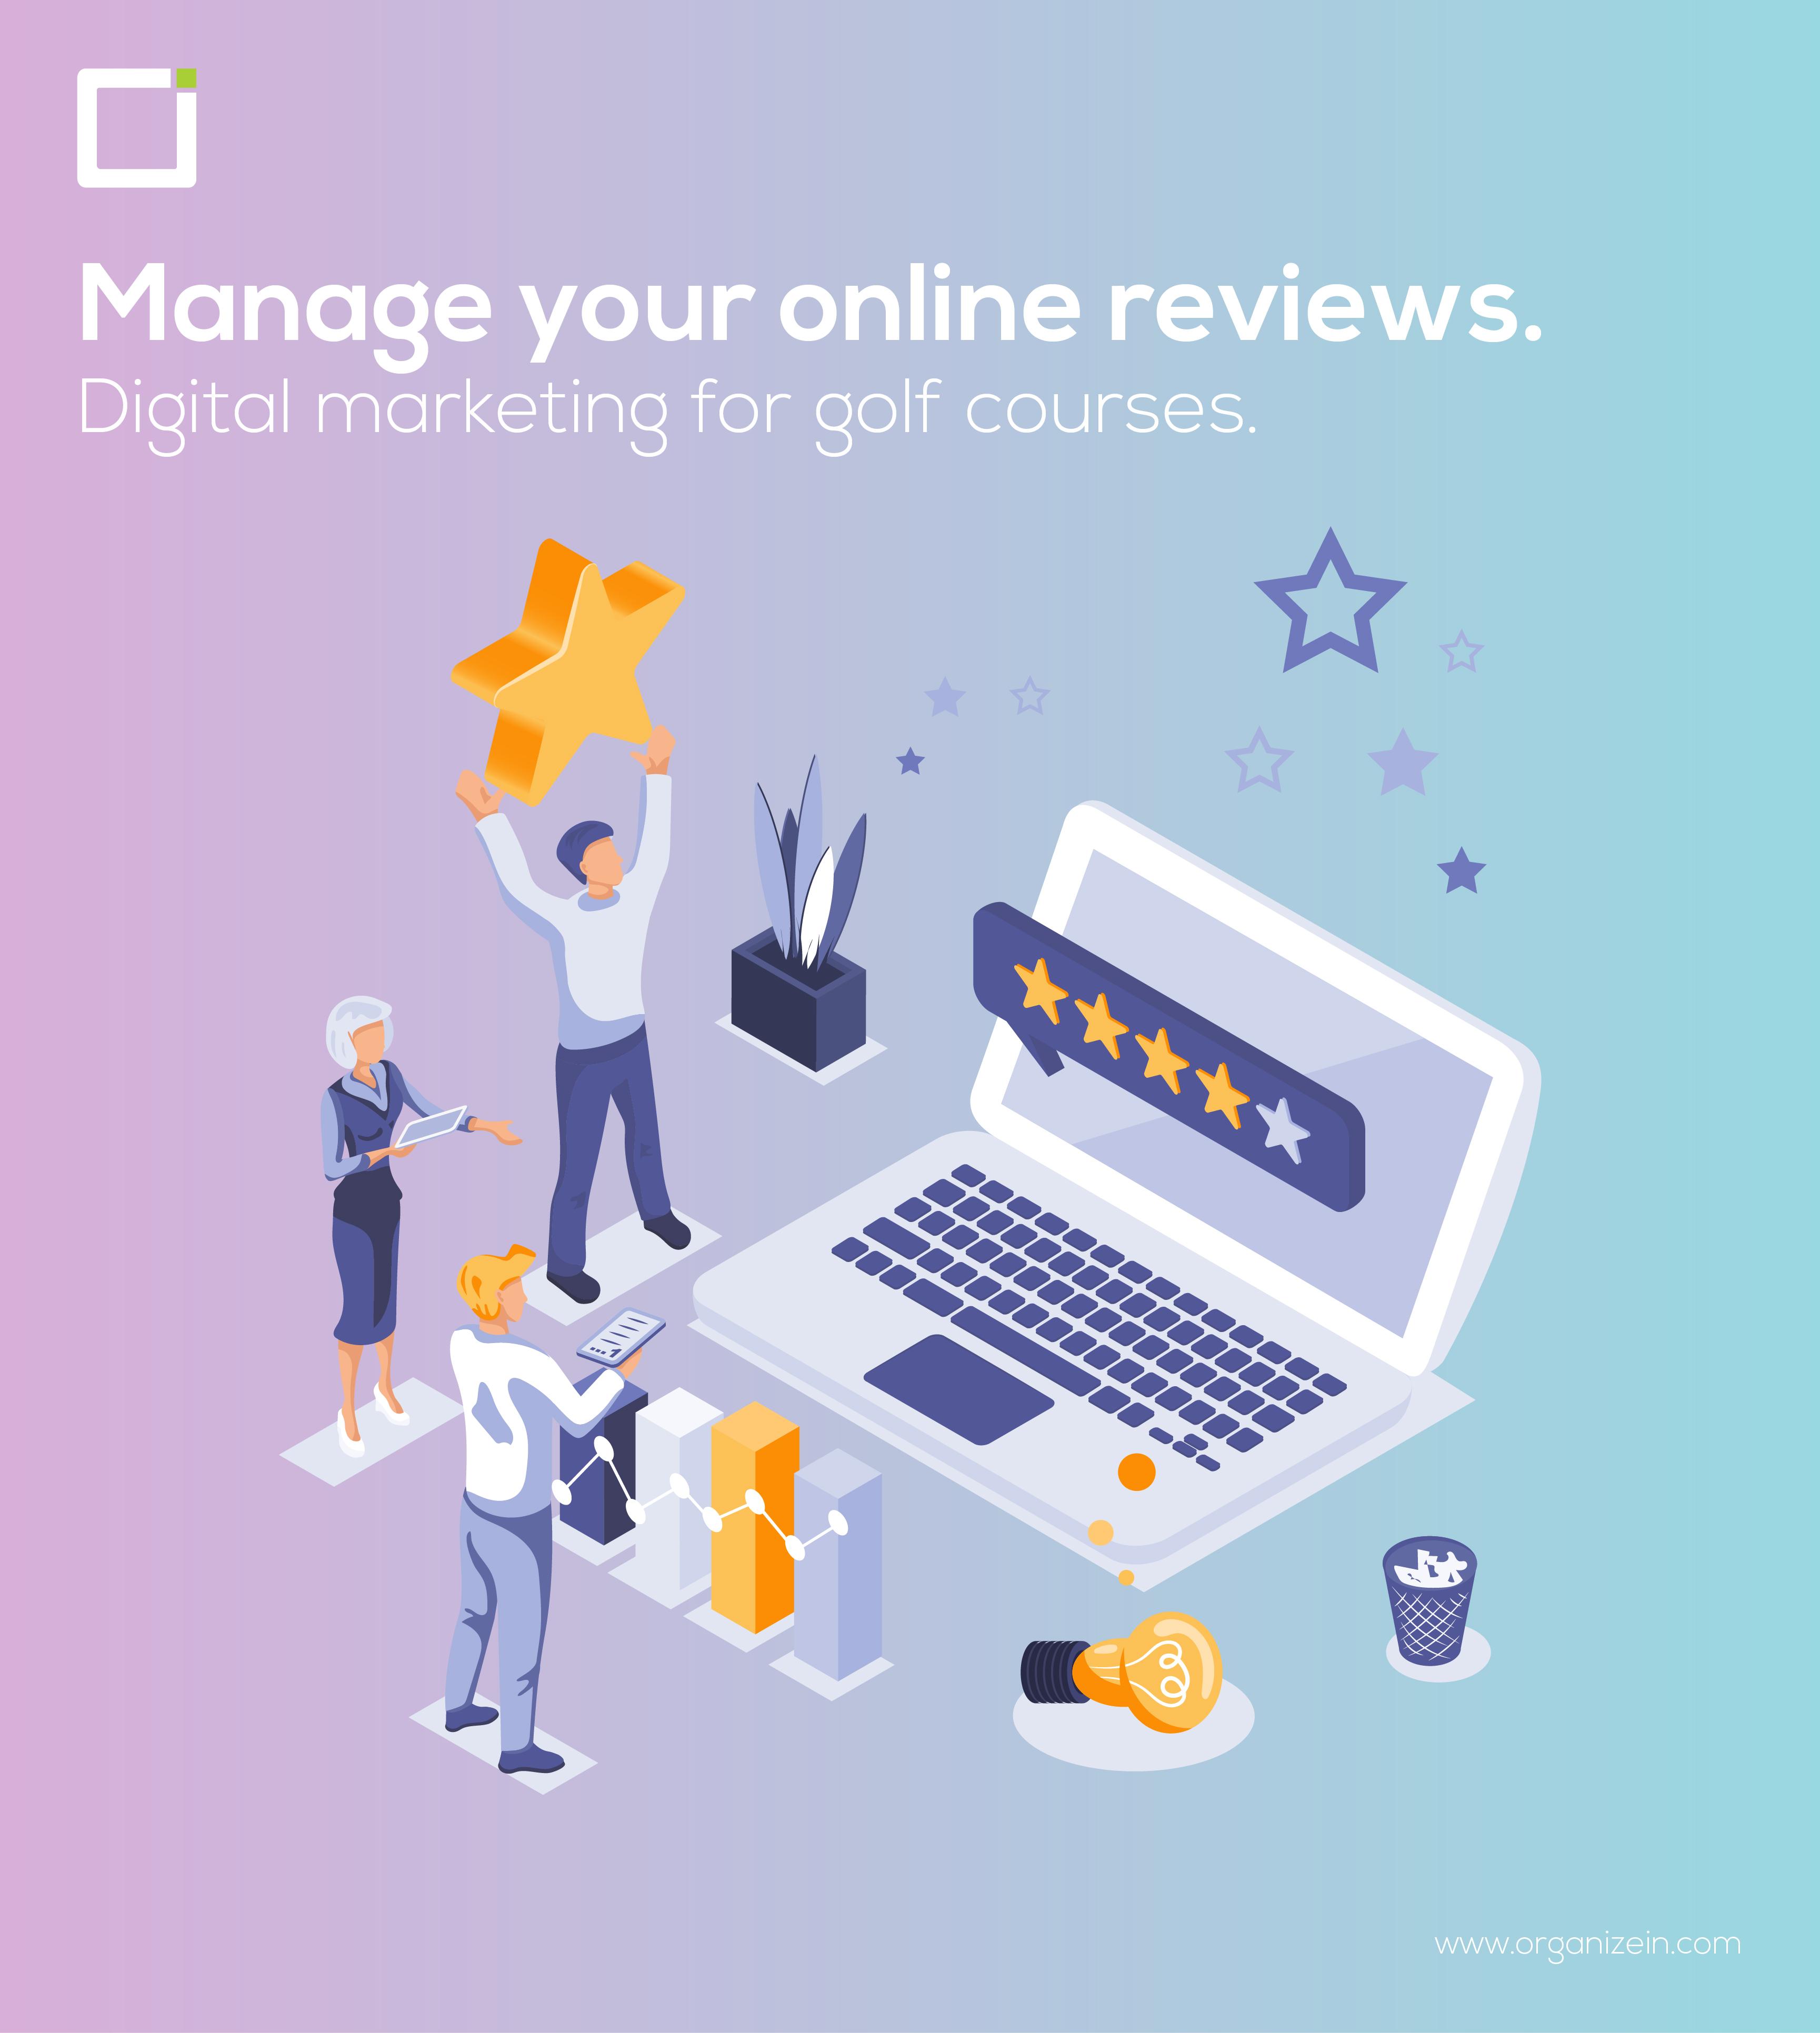 Digital marketing for golf courses